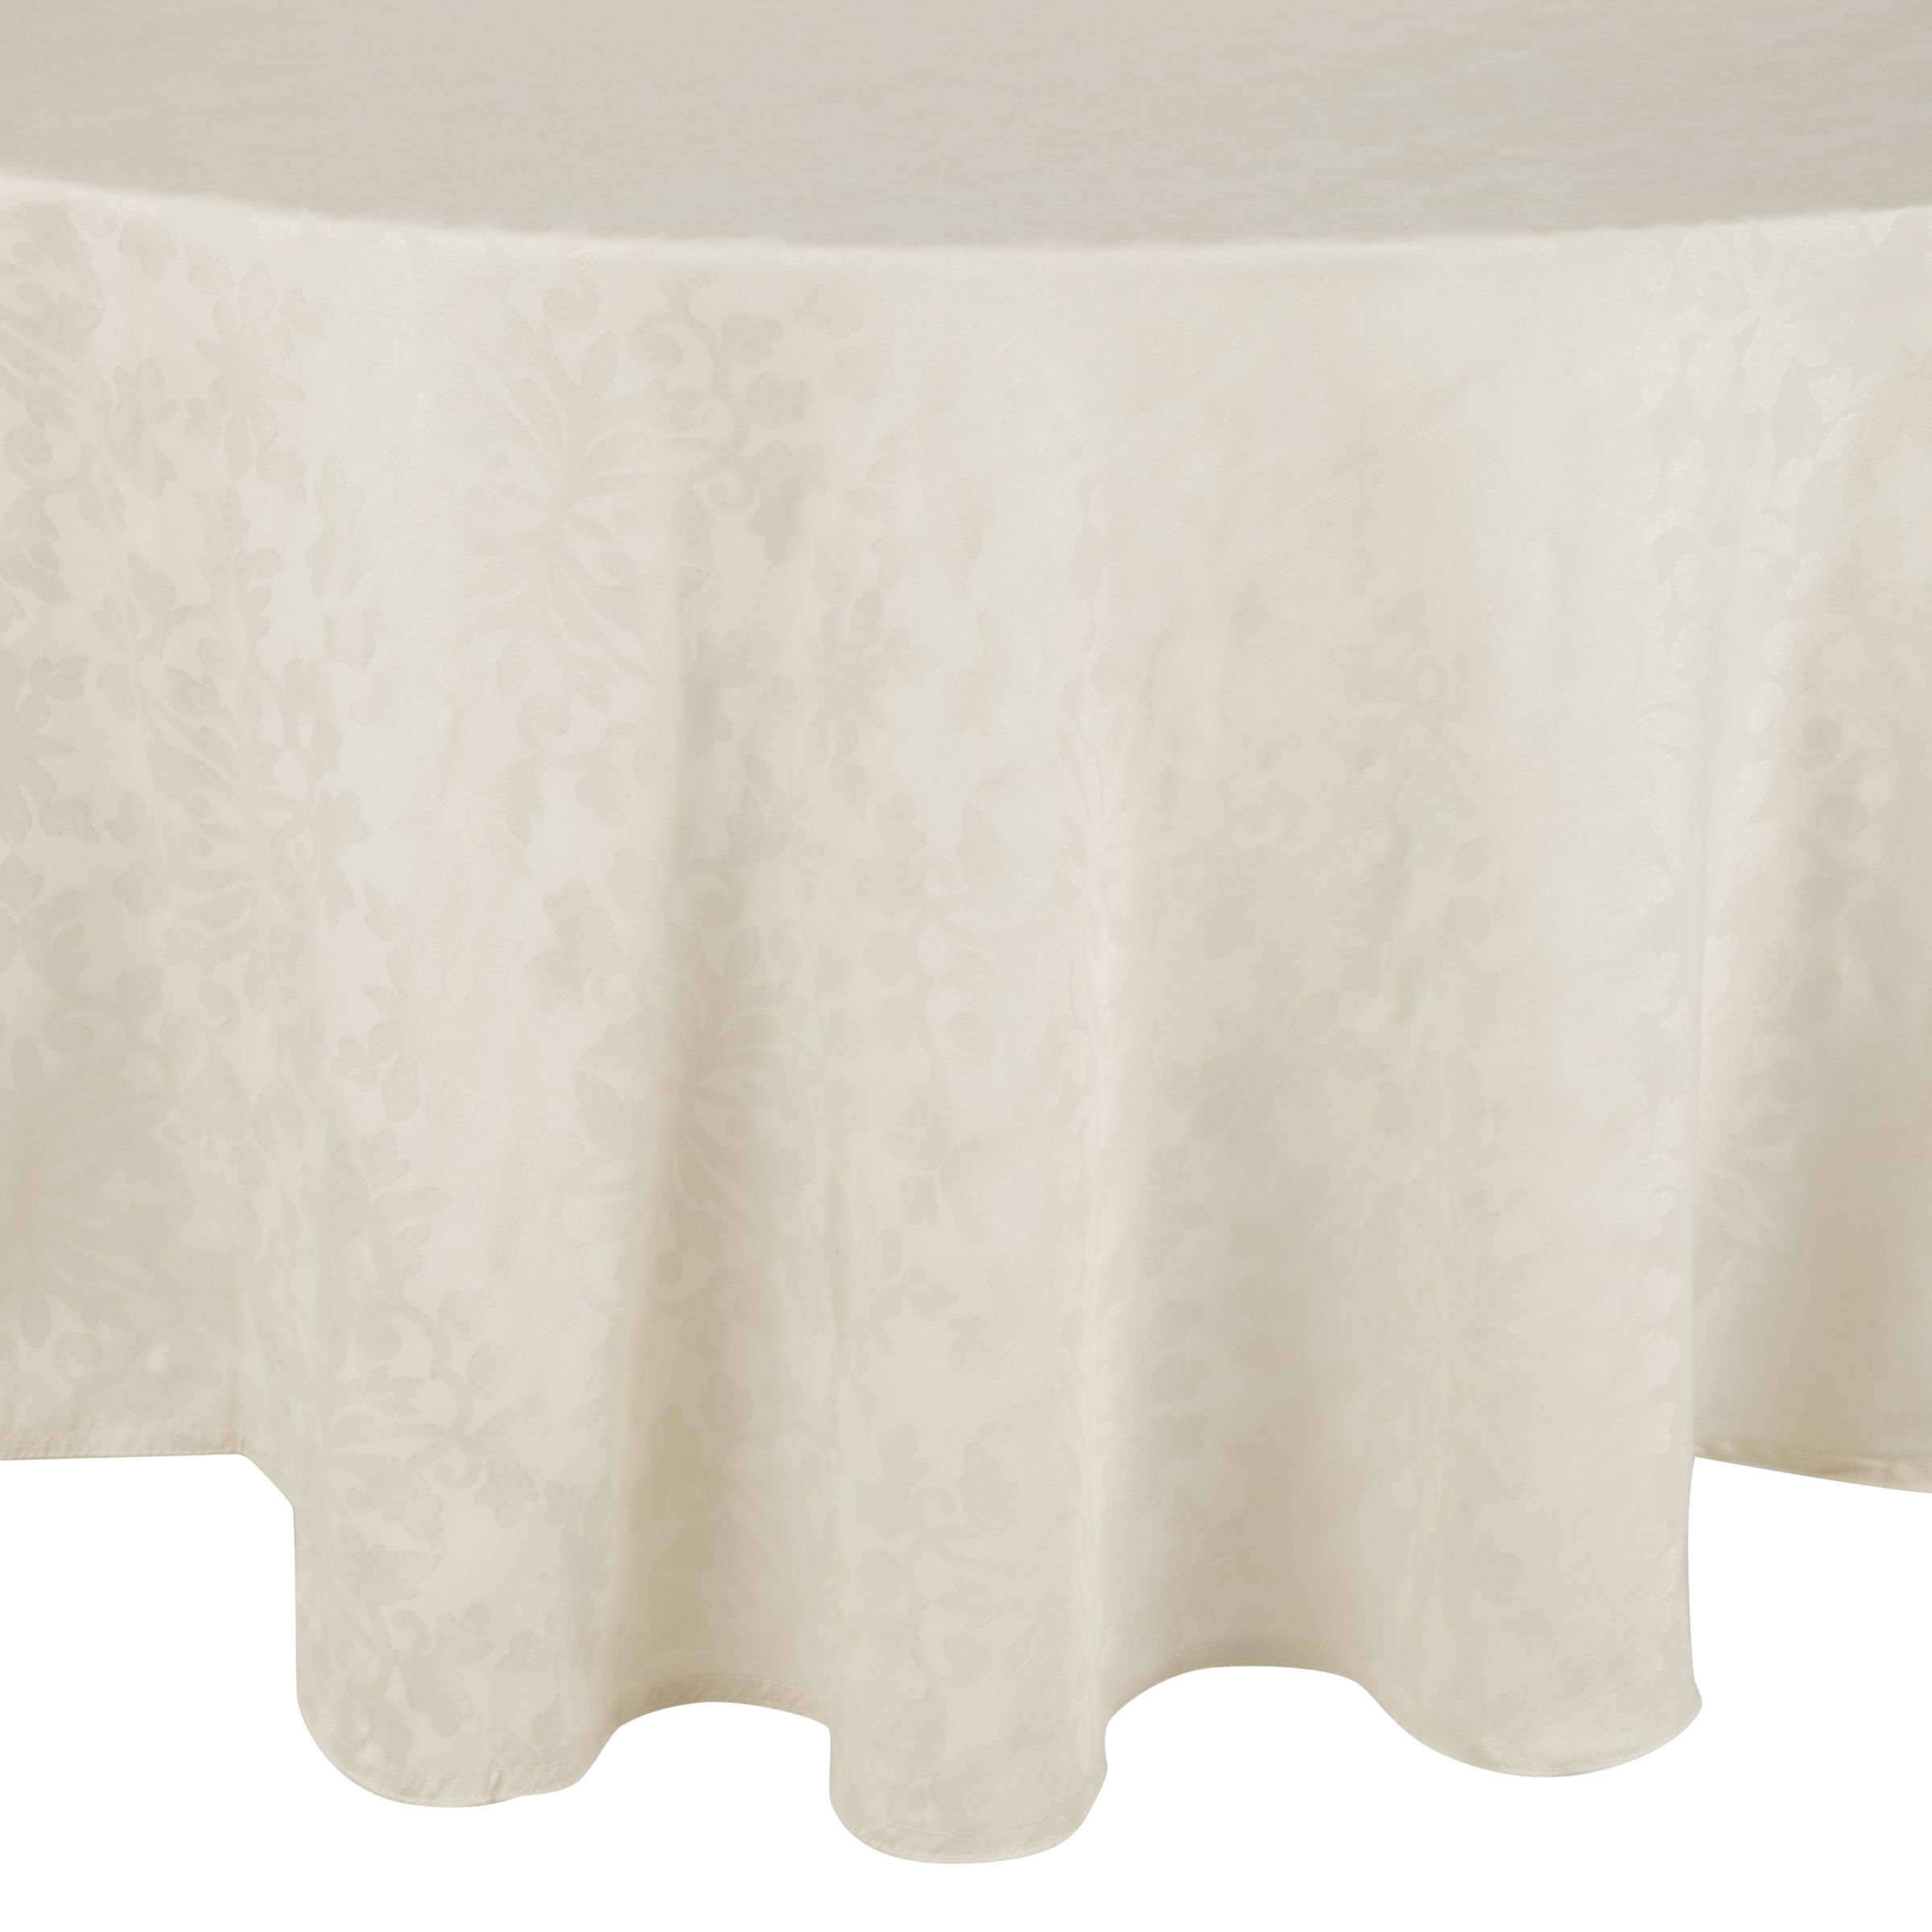 John Lewis Pemberley Damask Oval Tablecloth Cream L250 X W160cm At John Lewis Partners